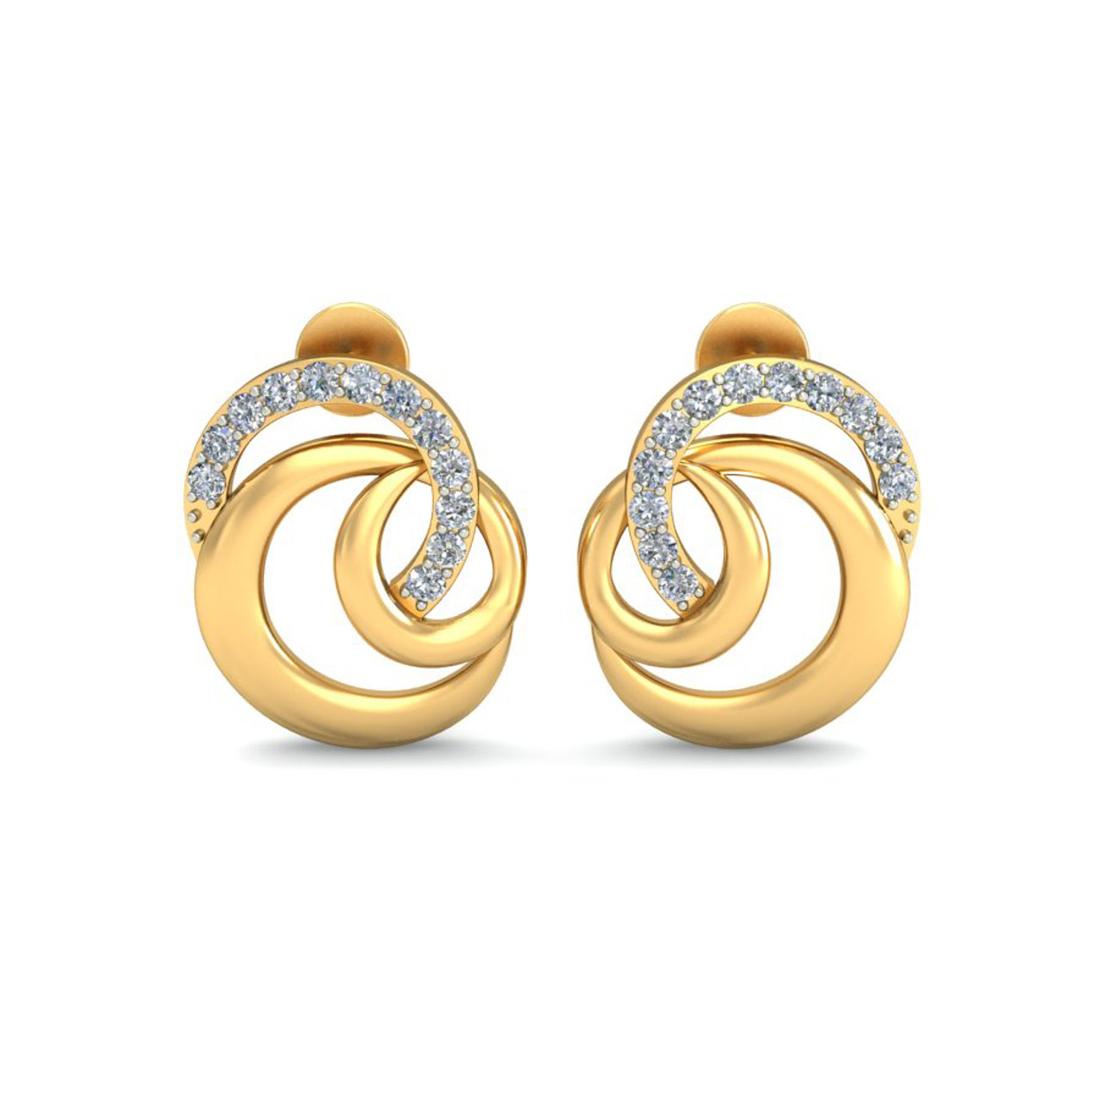 Ornomart's dual circle  Earrings